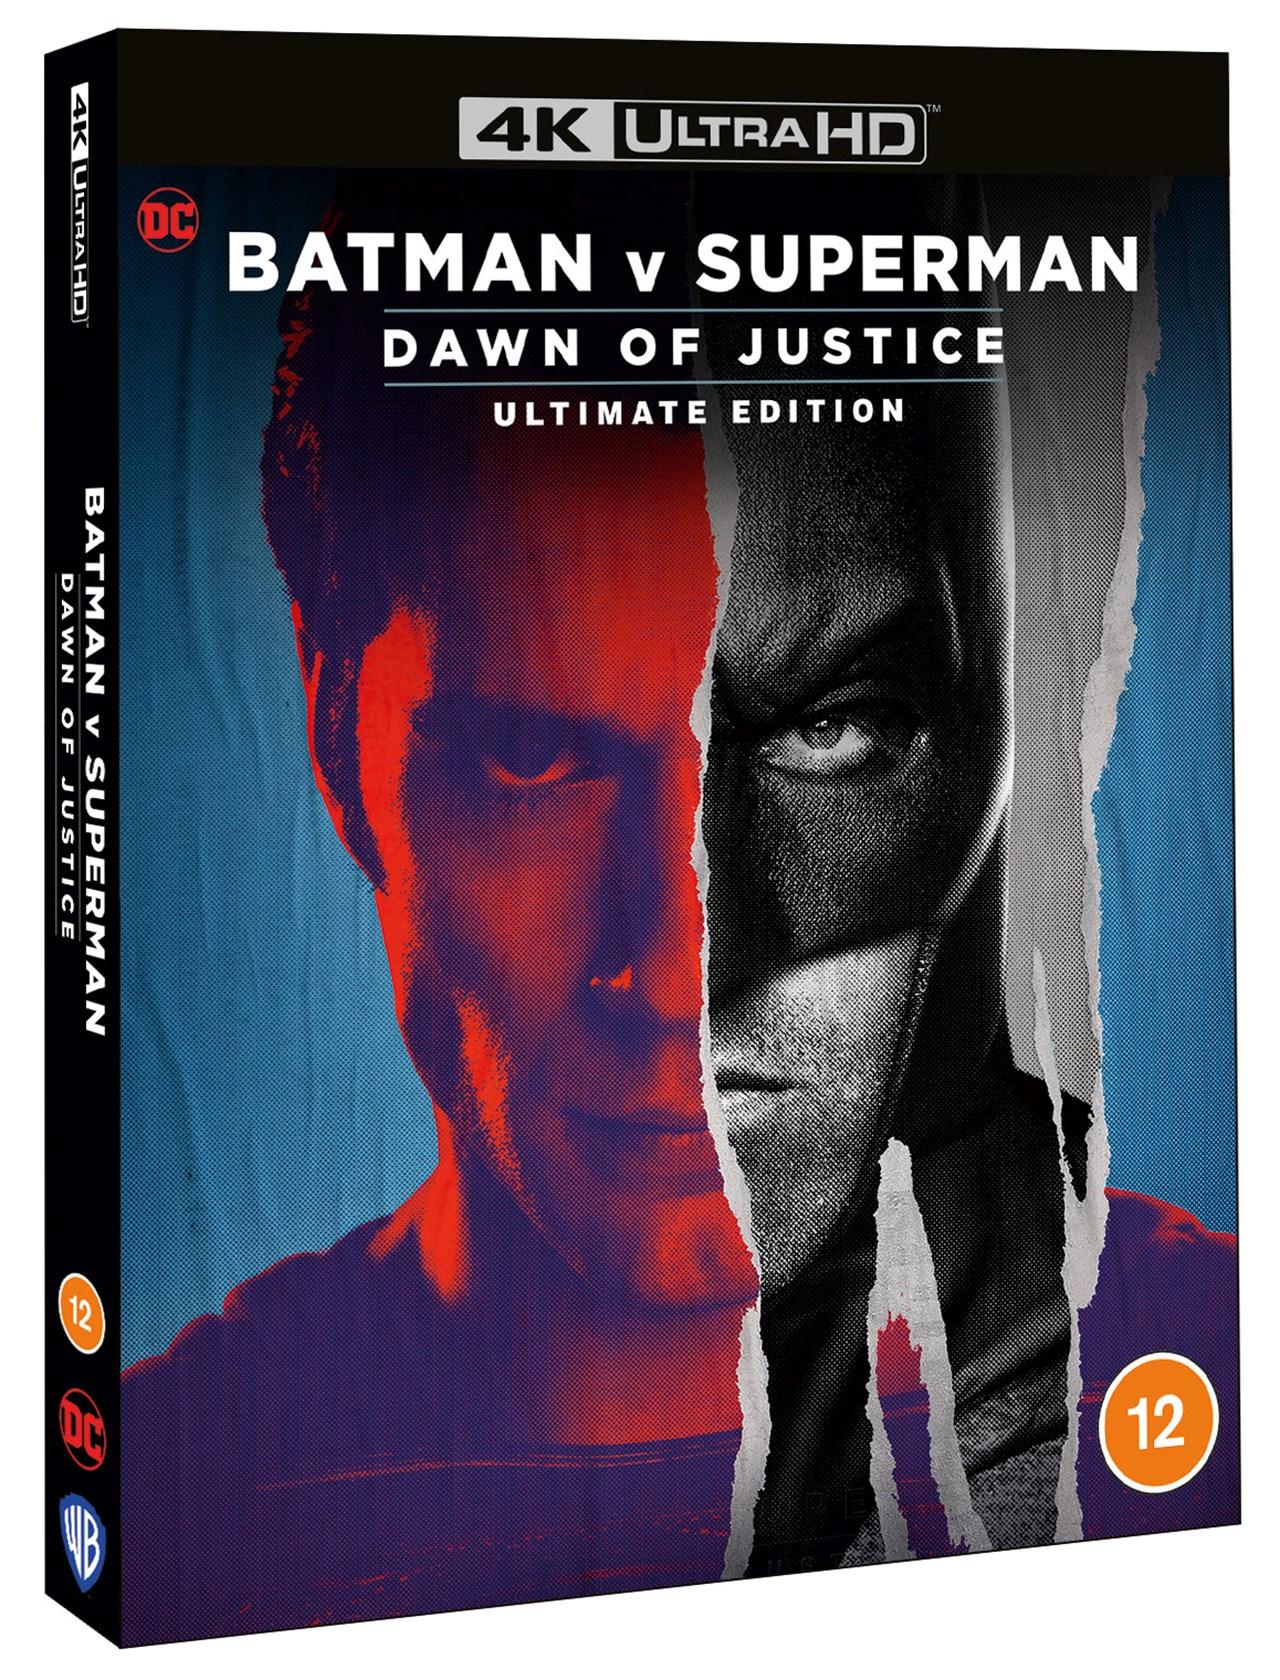 Batman V Superman - Dawn of Justice: Ultimate Edition (Remastered) - 2